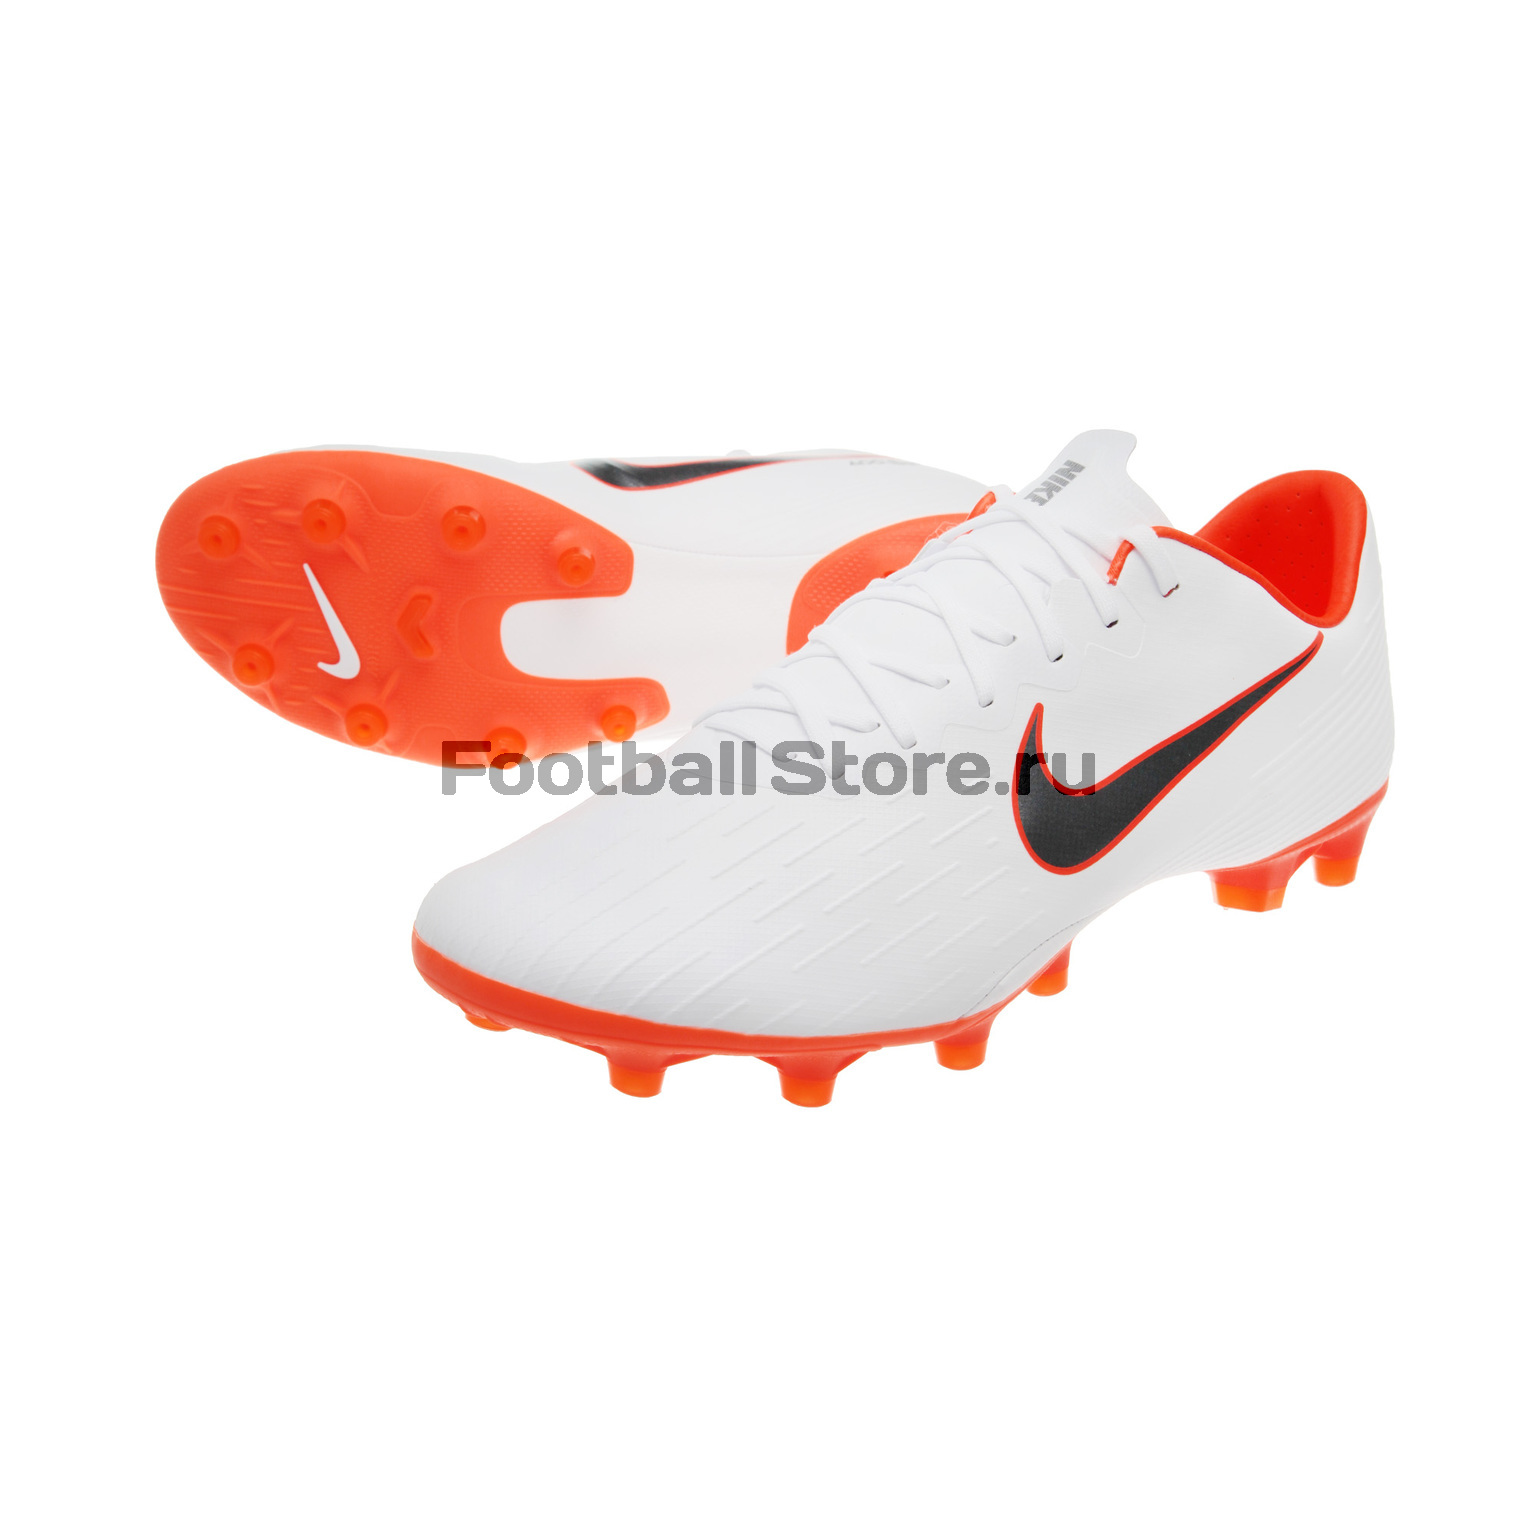 Бутсы Nike Mercurial Vapor 12 Pro AG-Pro AH8759-107 joli rouge губная помада 749 bubble gum pink